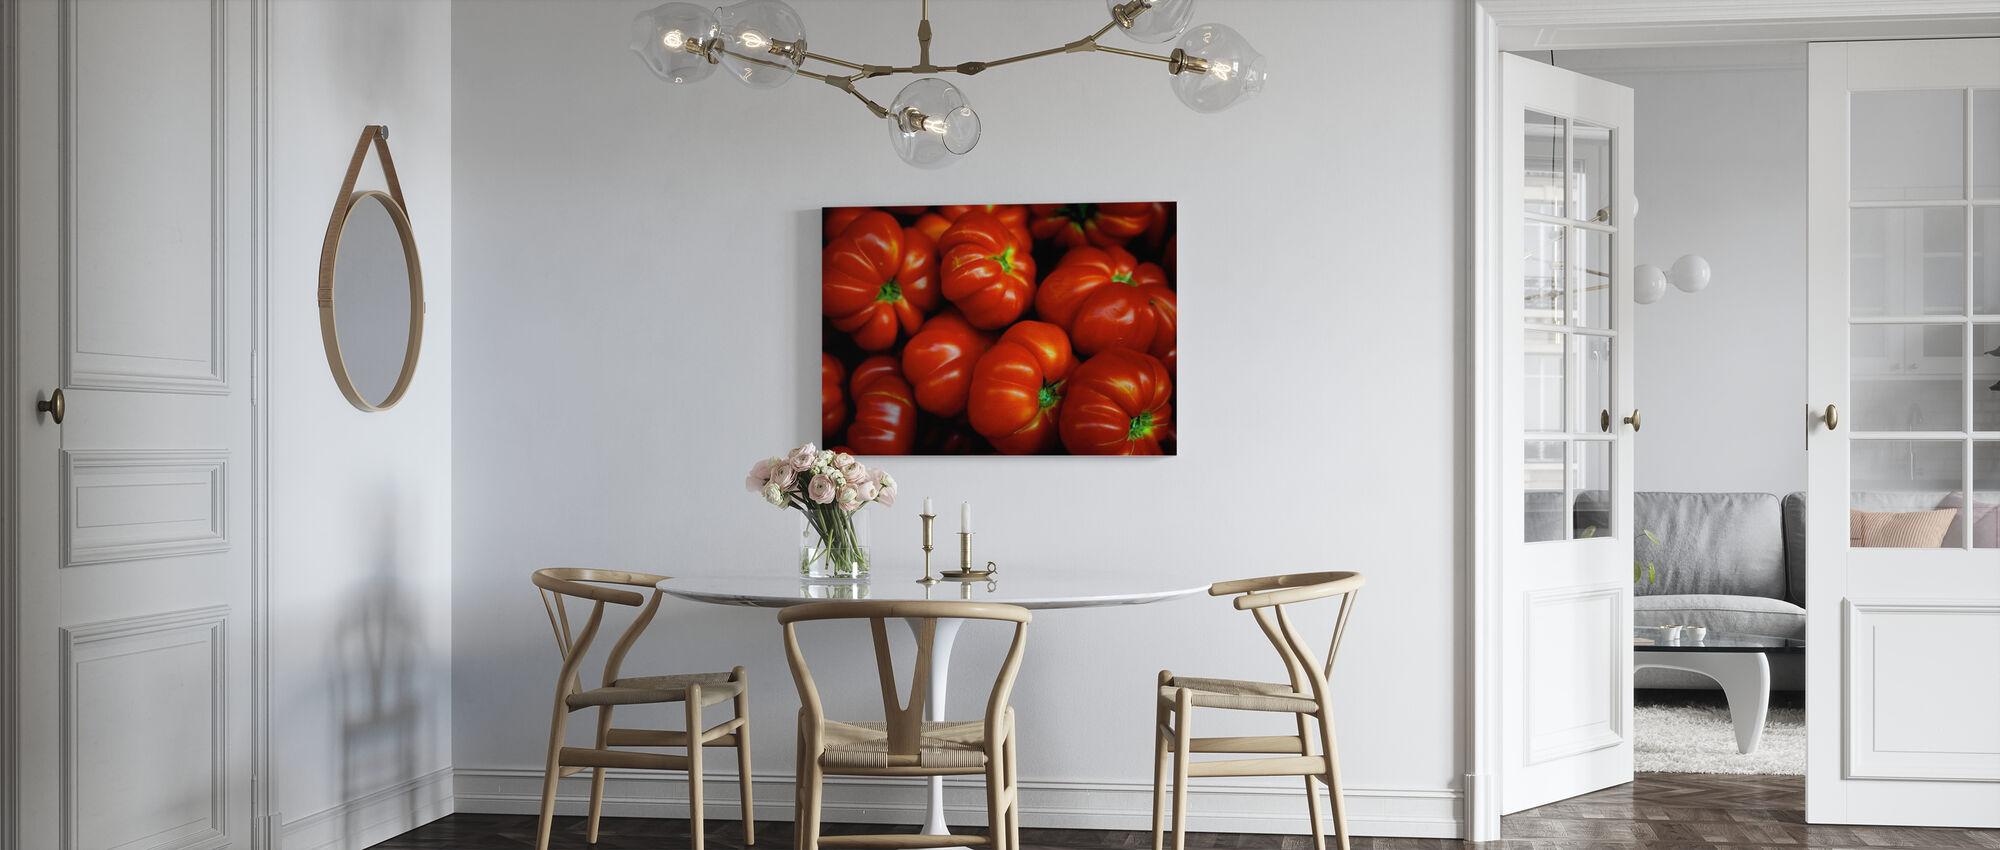 Pomodori Italiani - Stampa su tela - Cucina